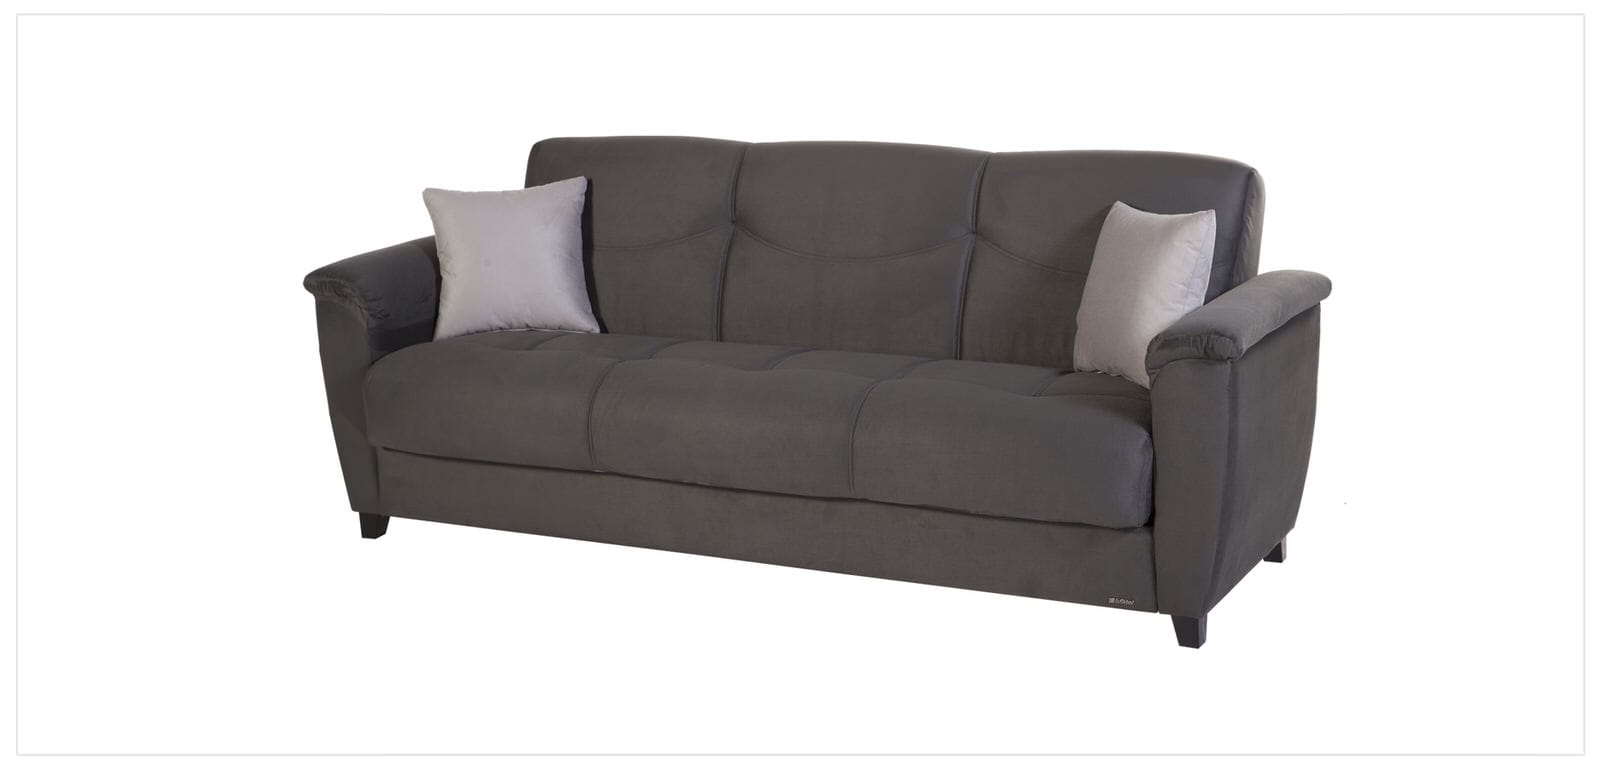 aspen convertible sectional storage sofa bed ikea green rainbow dark grey by istikbal